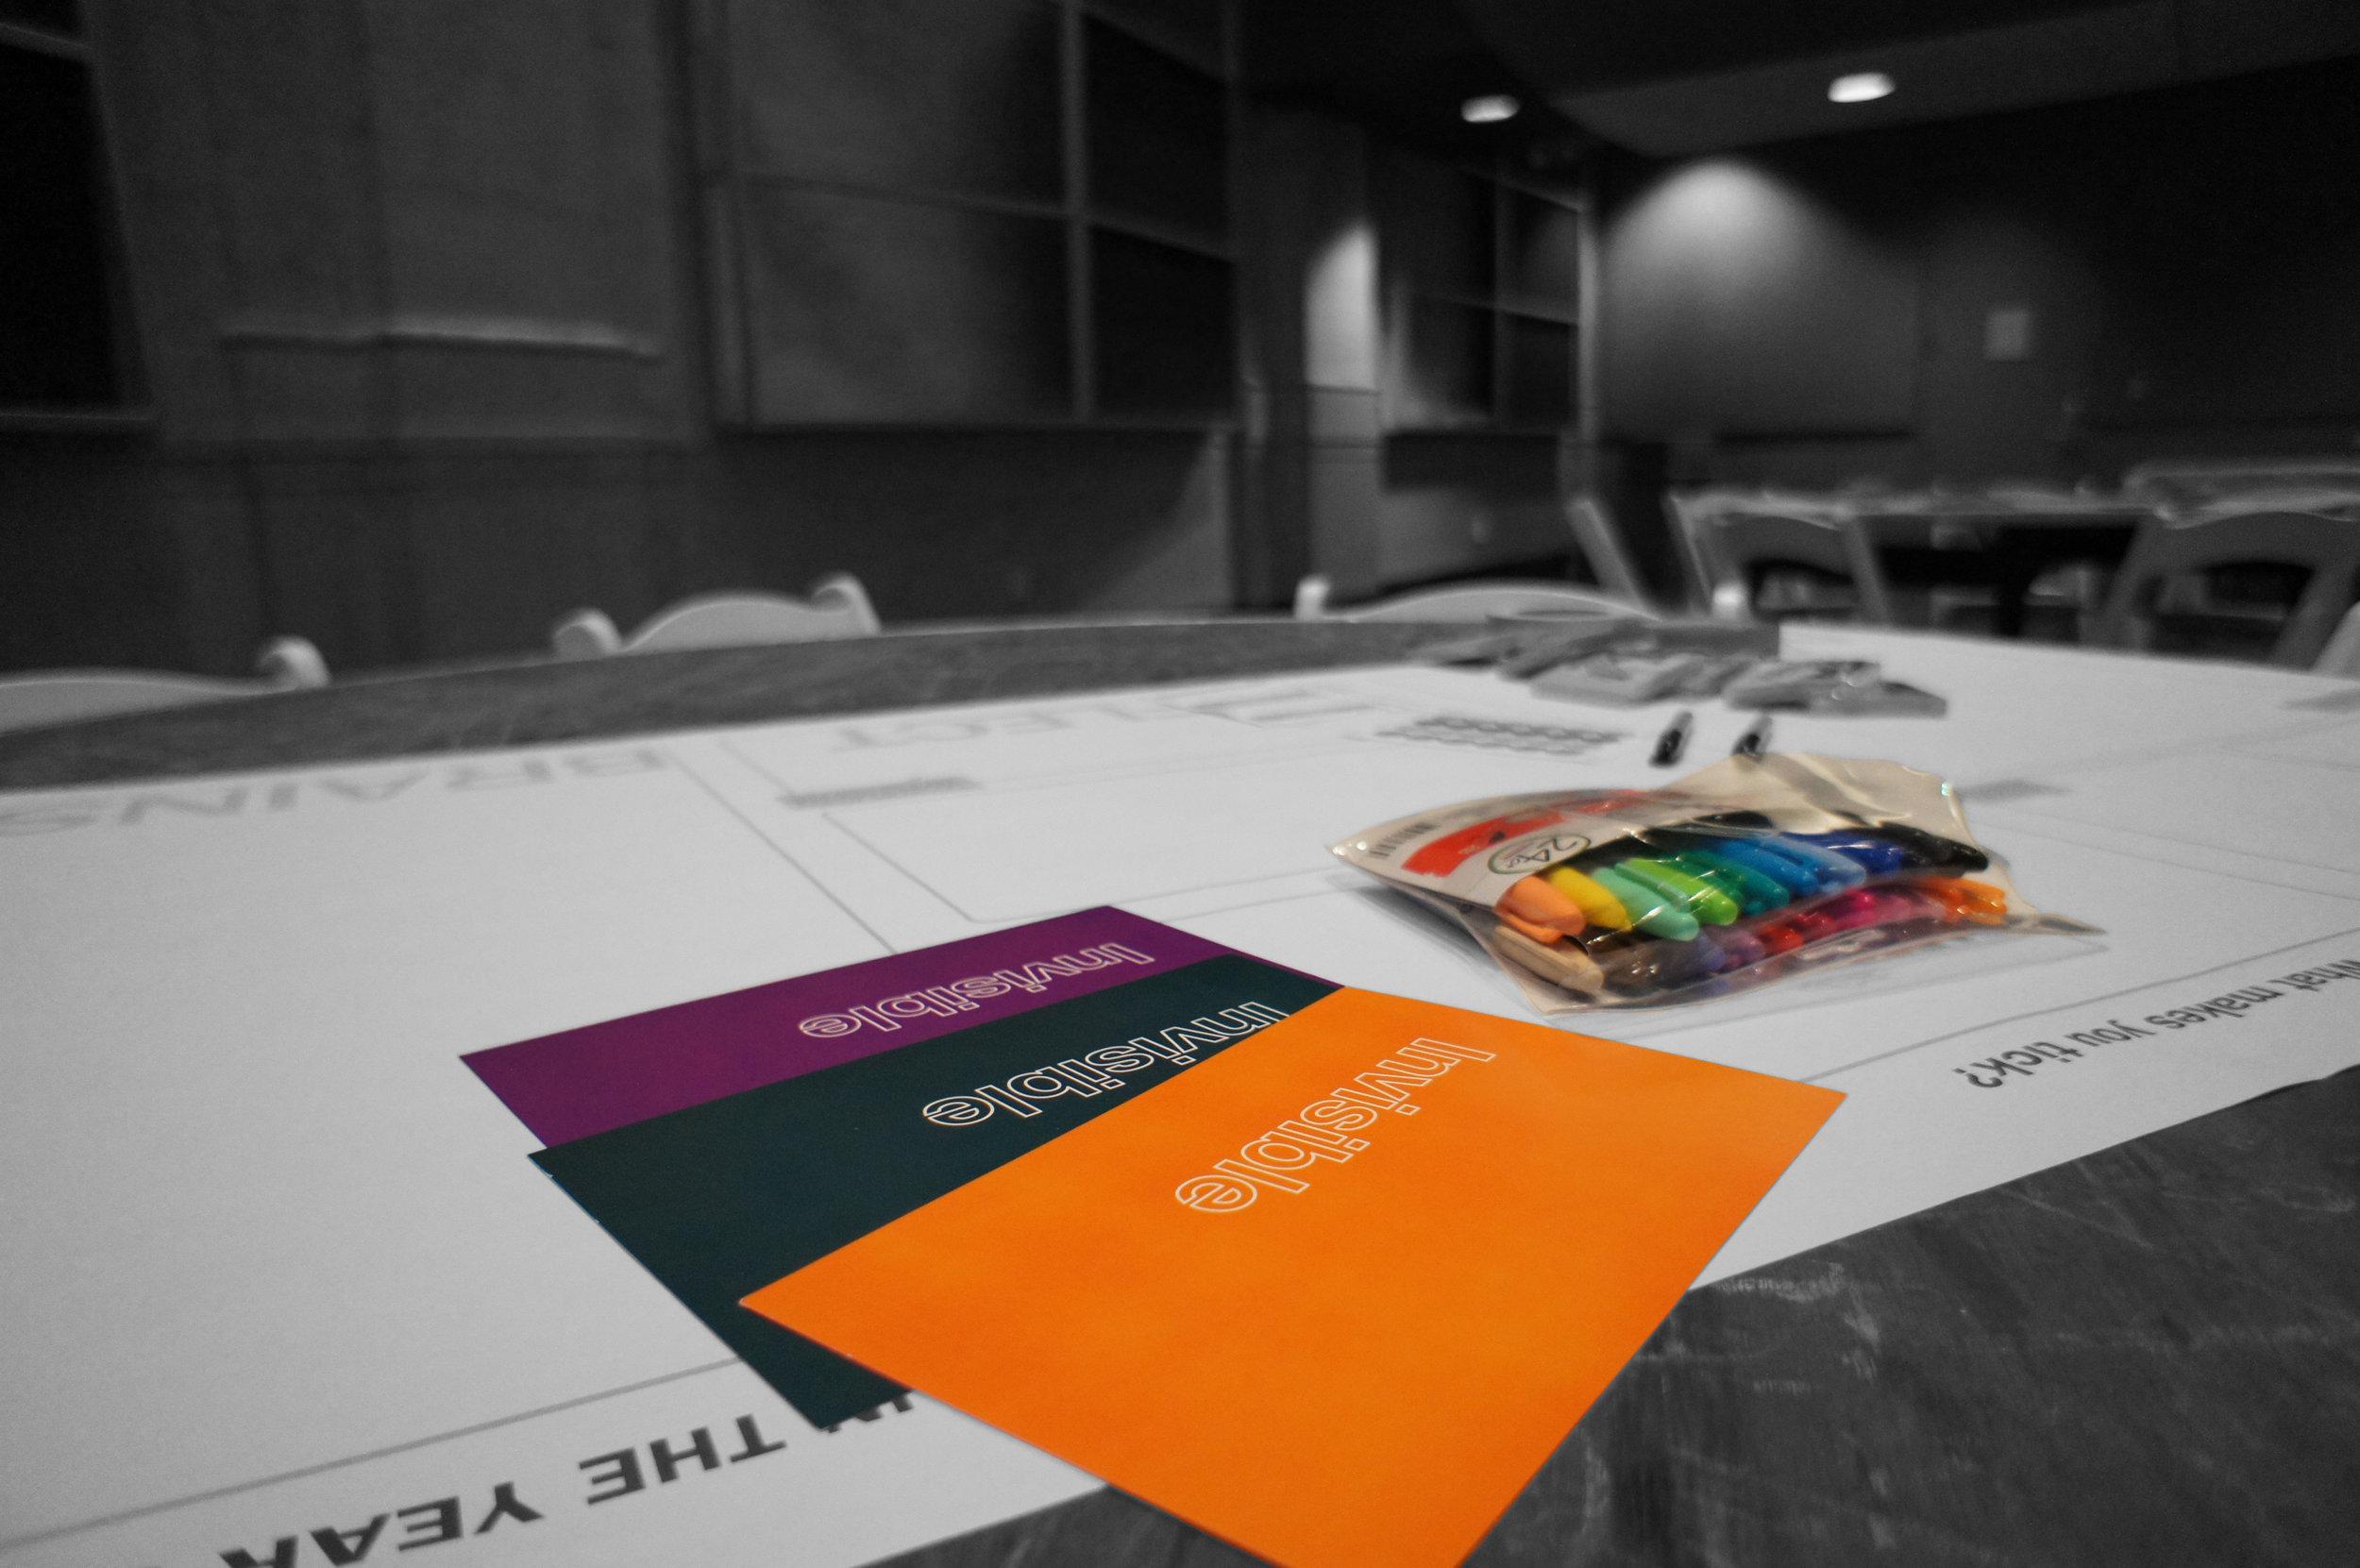 Designing Policy workshop materials